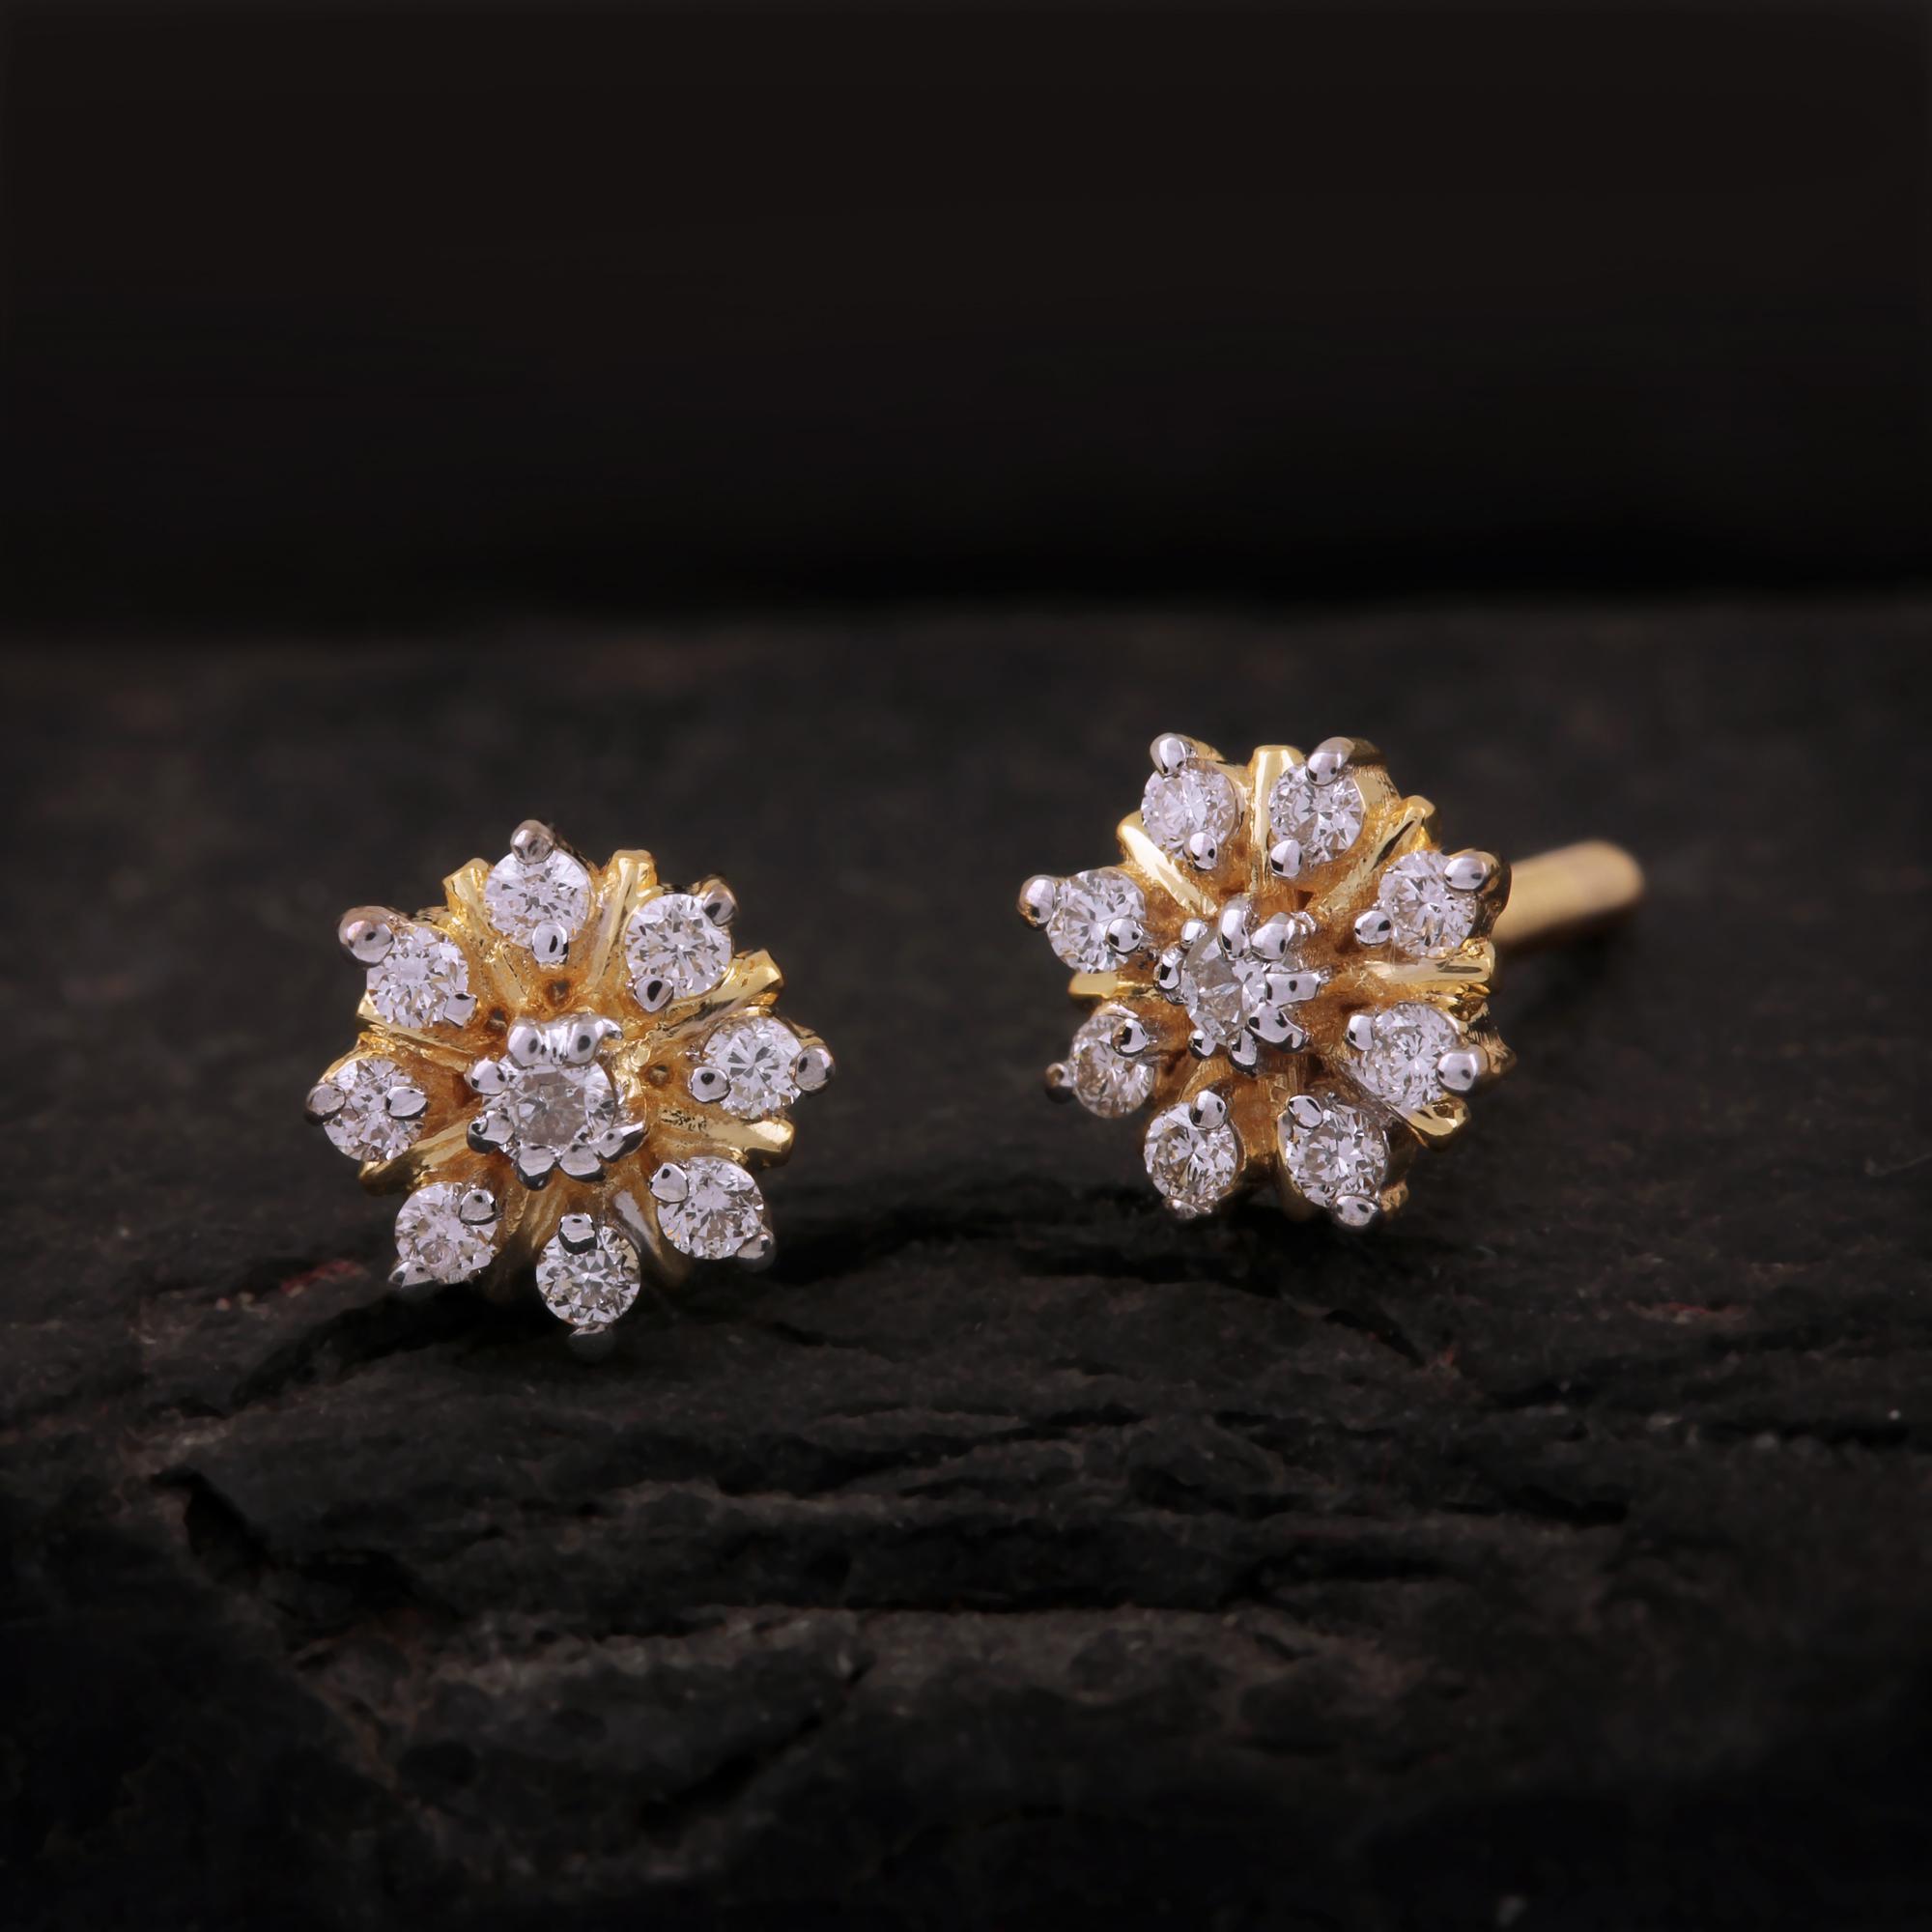 Yellow Gold Diamond Stud Earrings